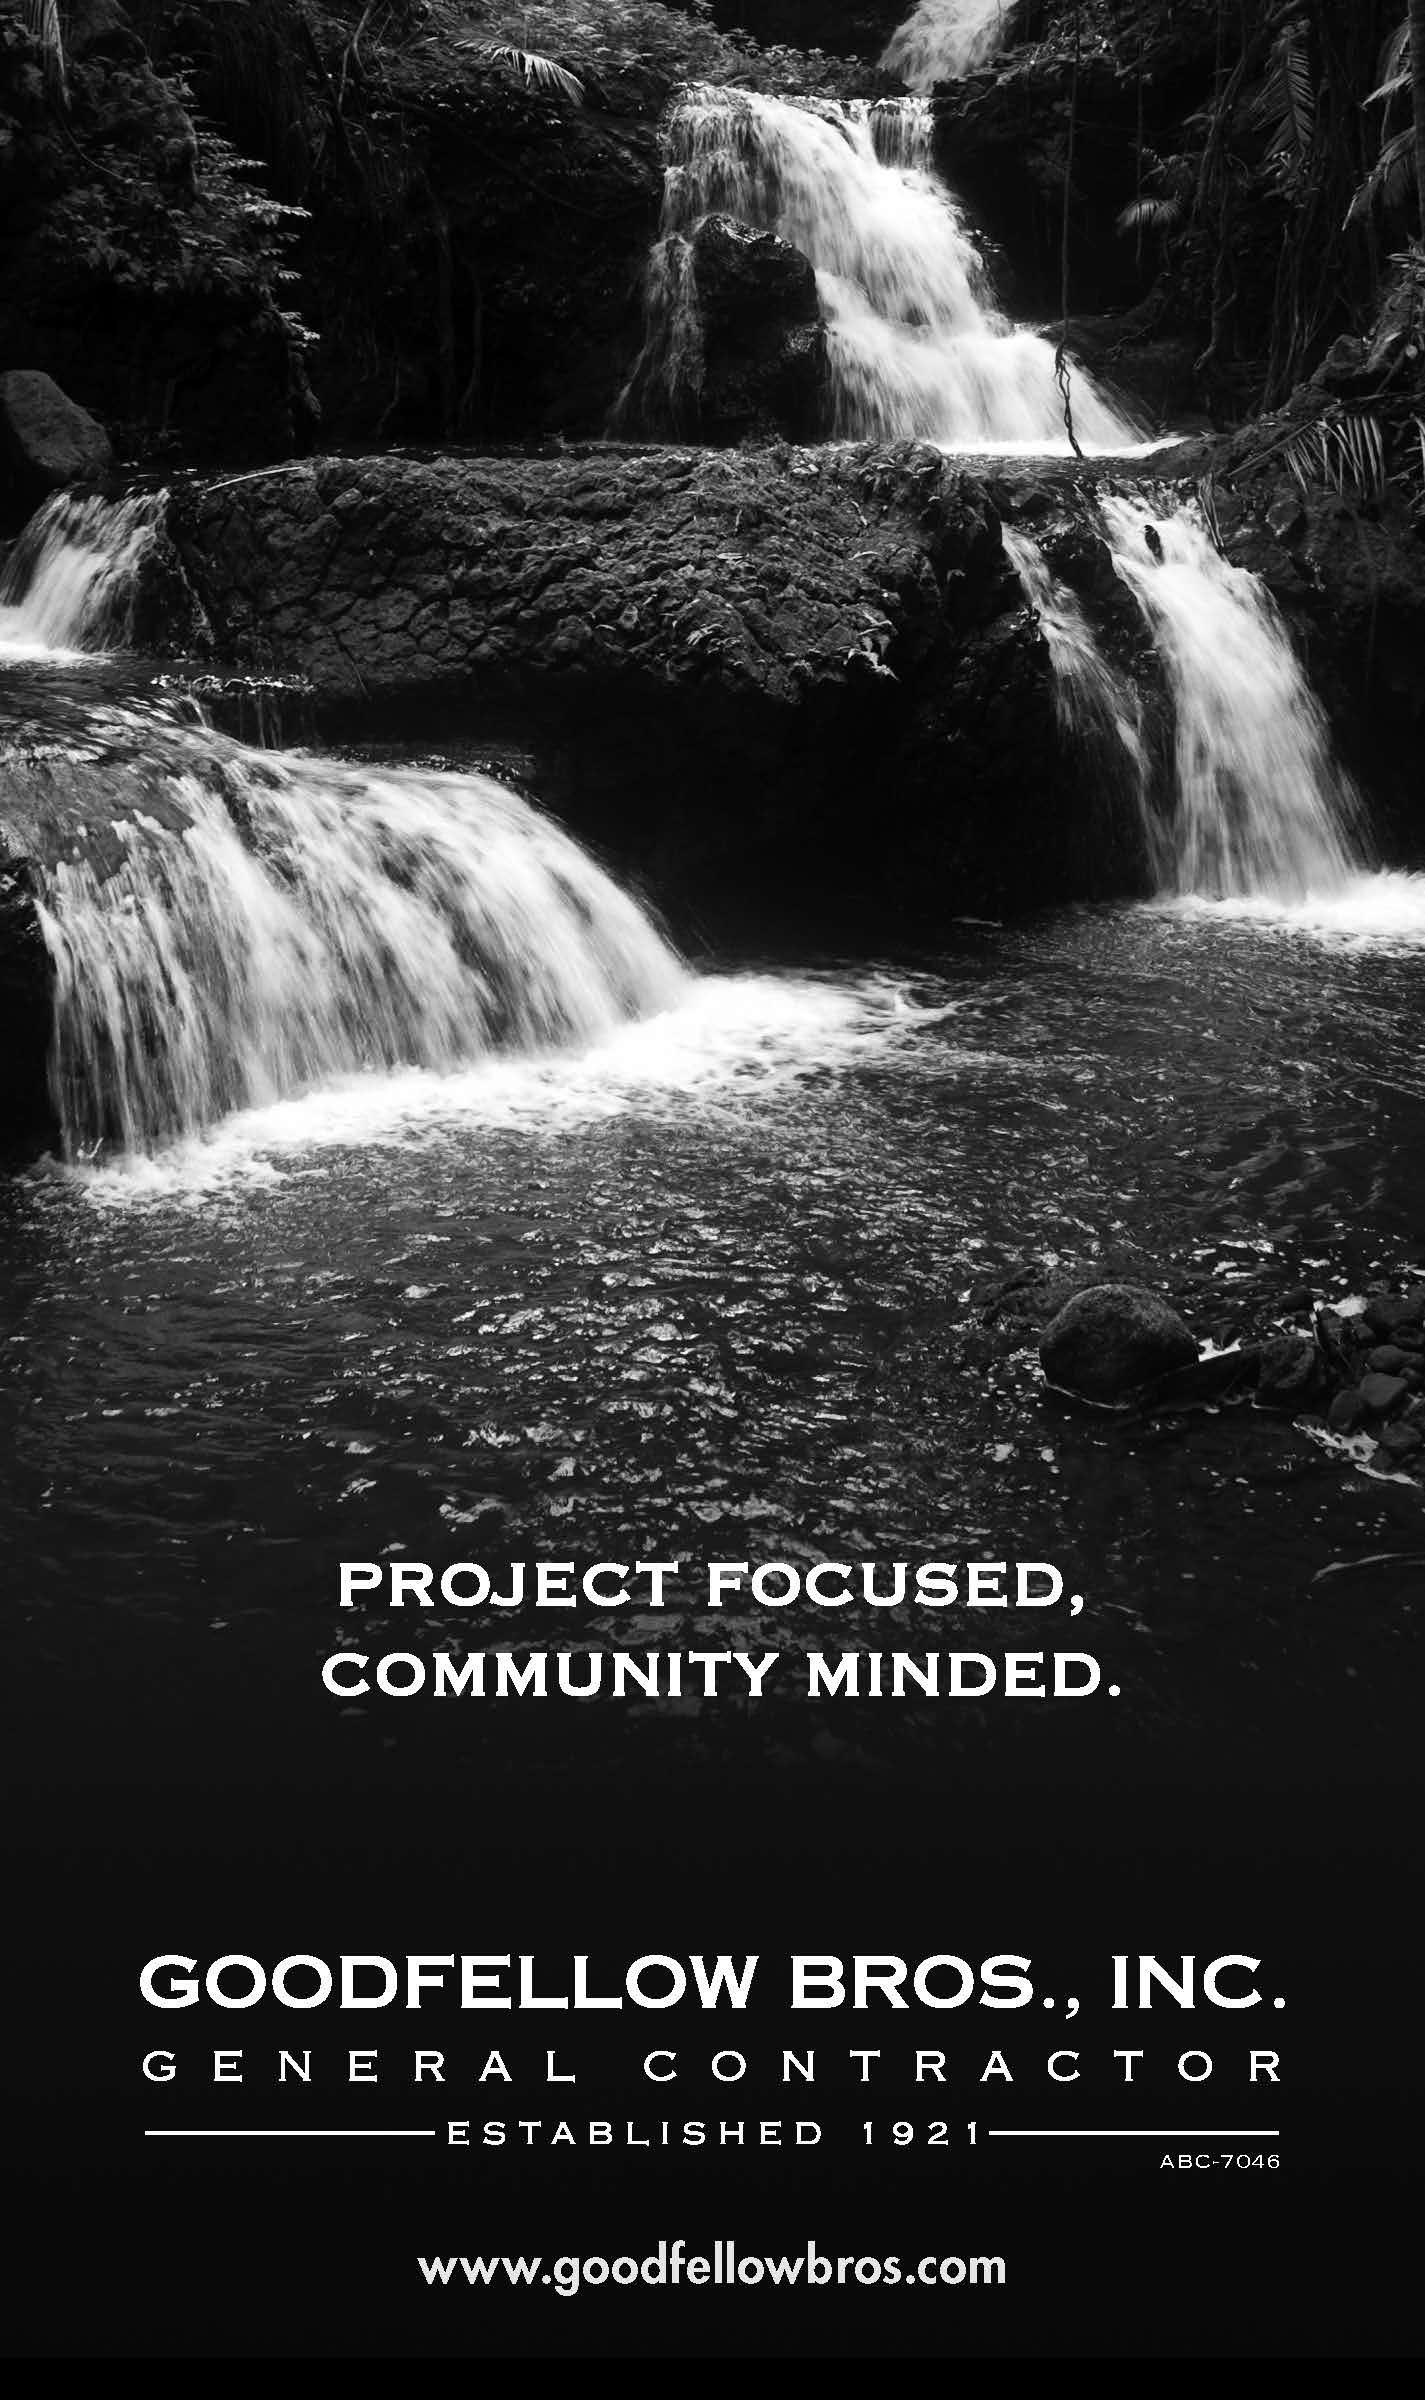 American Water Works Association Sponsorship 2013 (4.75 in. x 8 in.)  (556K)